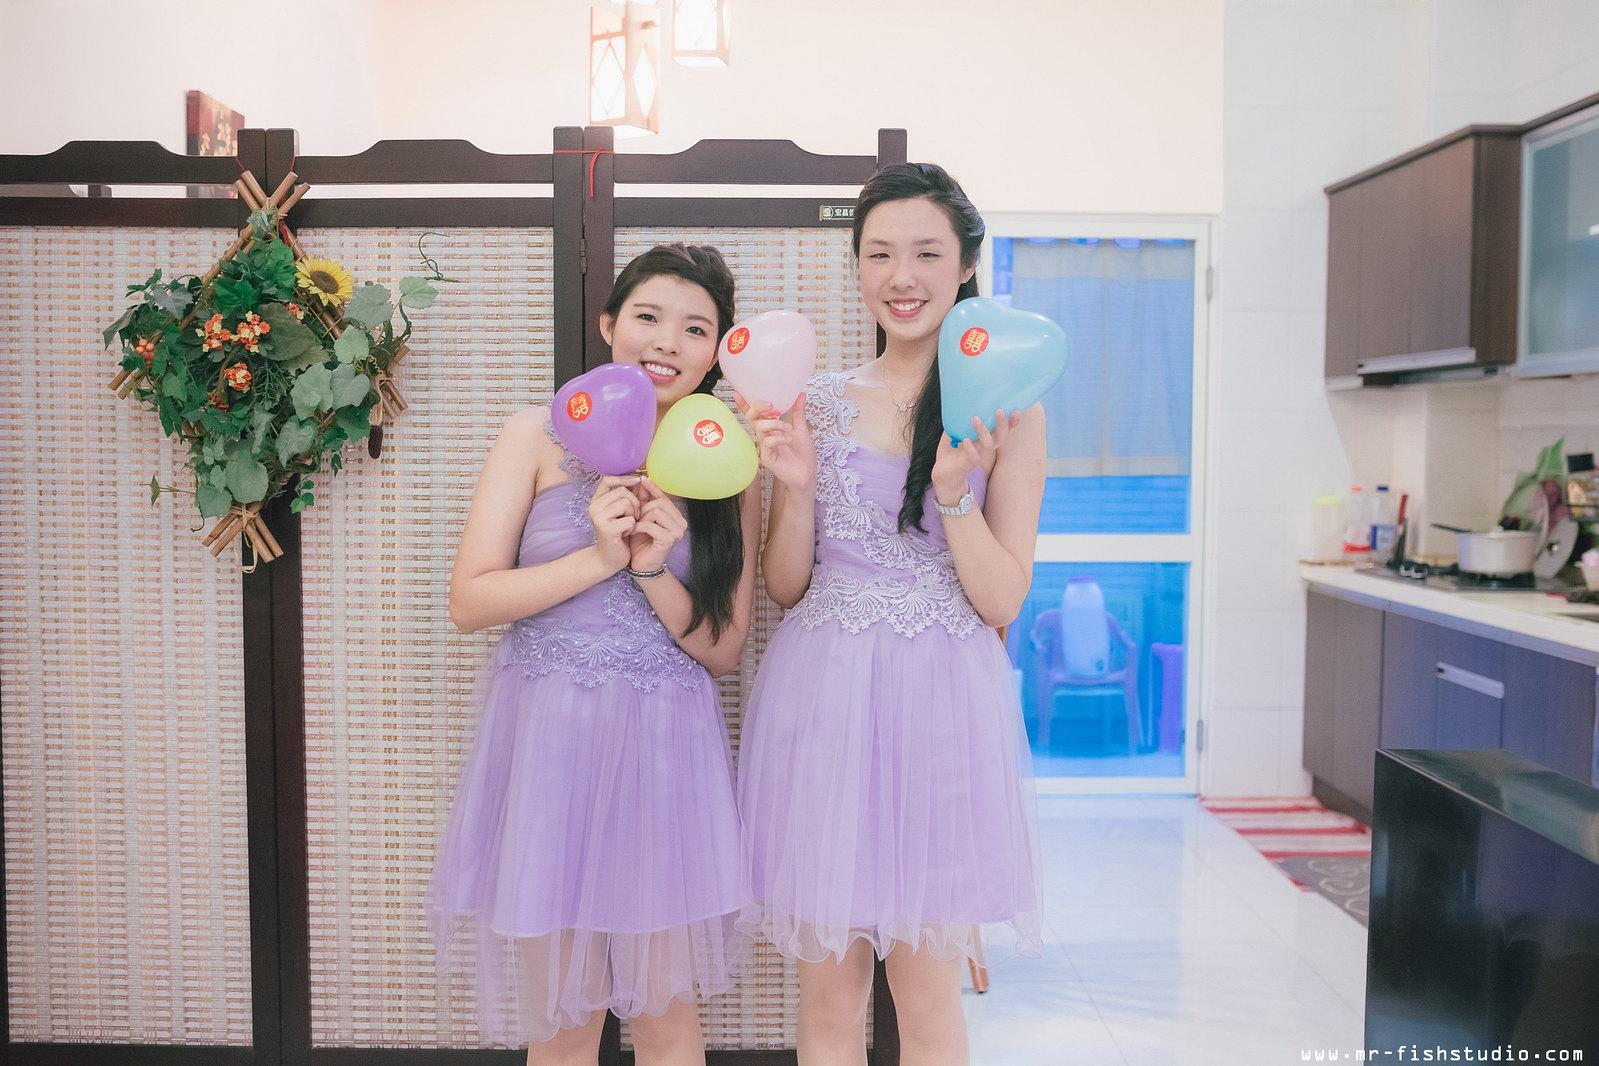 0522Wanfu+FloR133